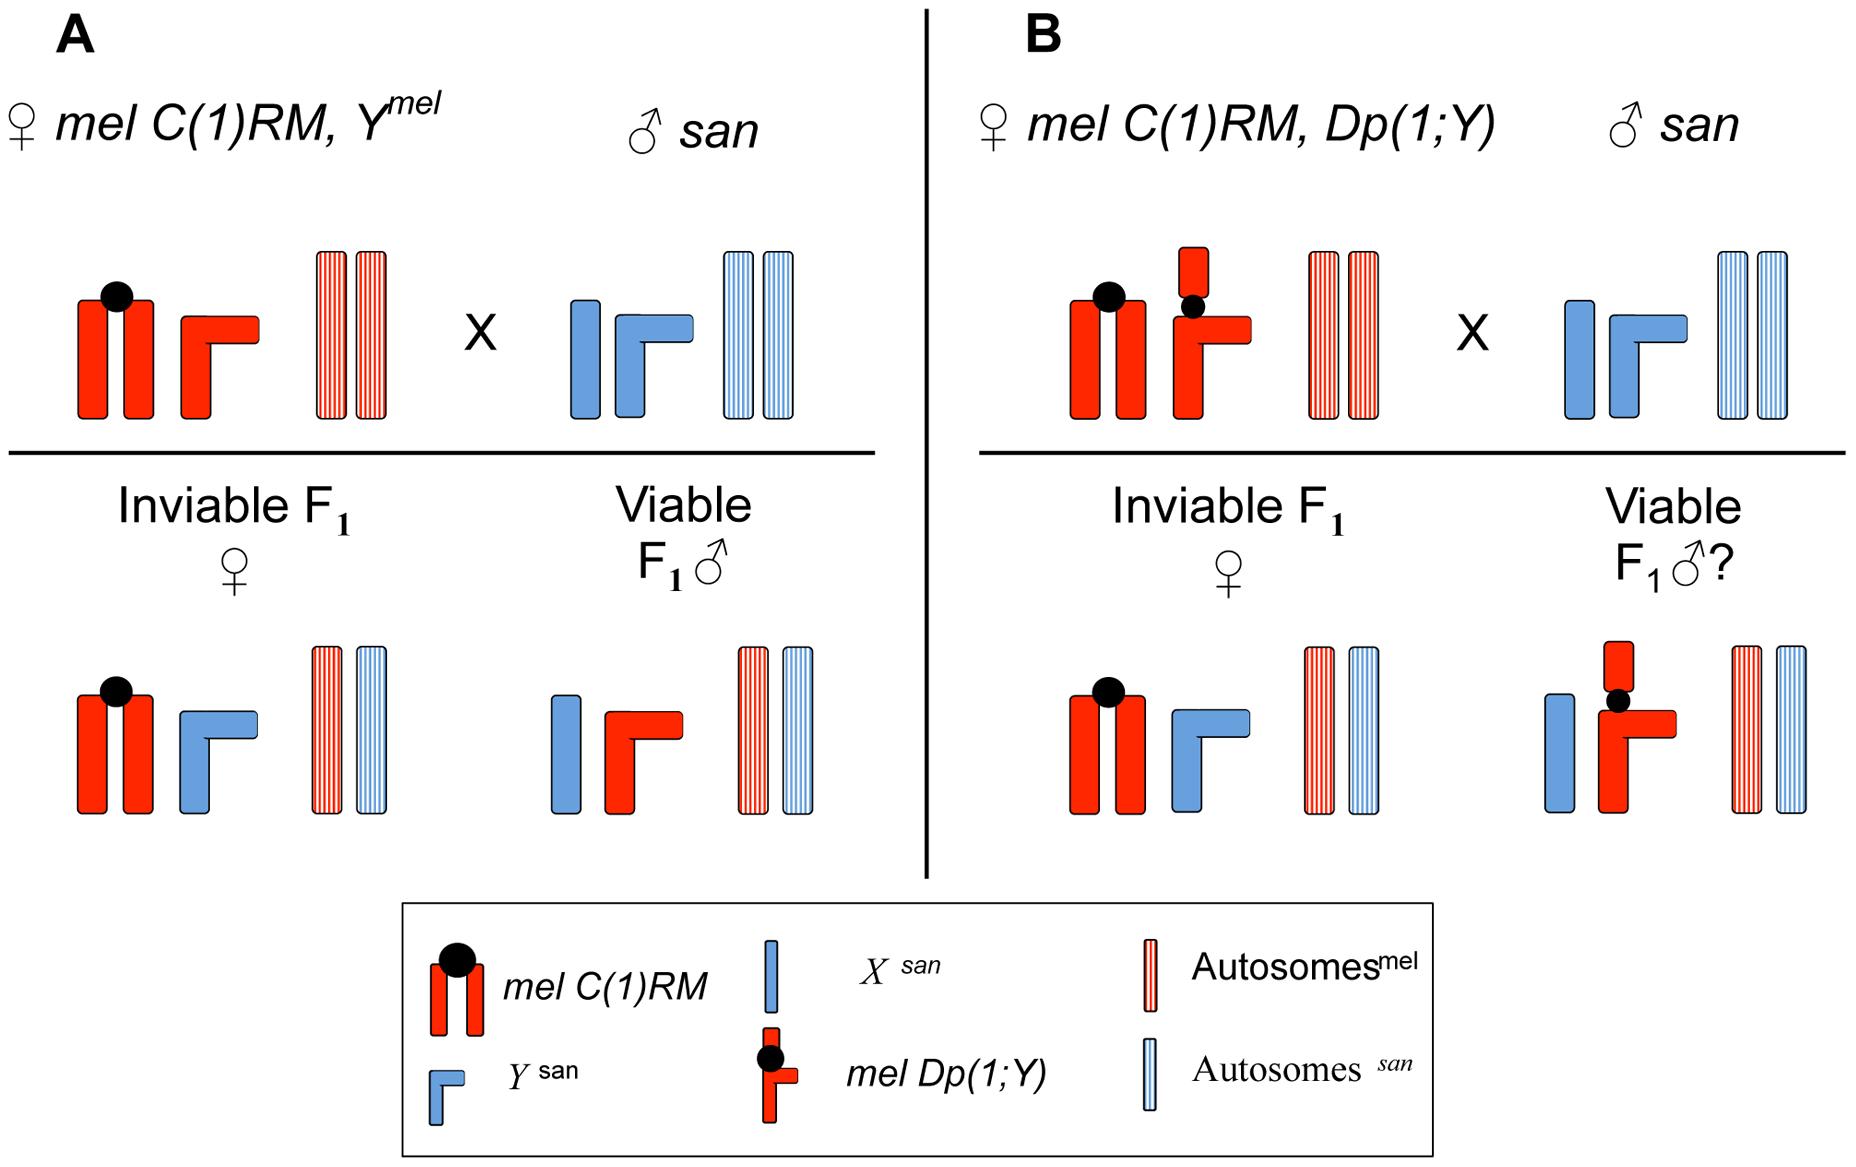 Crossing scheme to study the effect of <i>X</i>-linked chromosomal duplications in <i>mel/san</i> hybrid males.